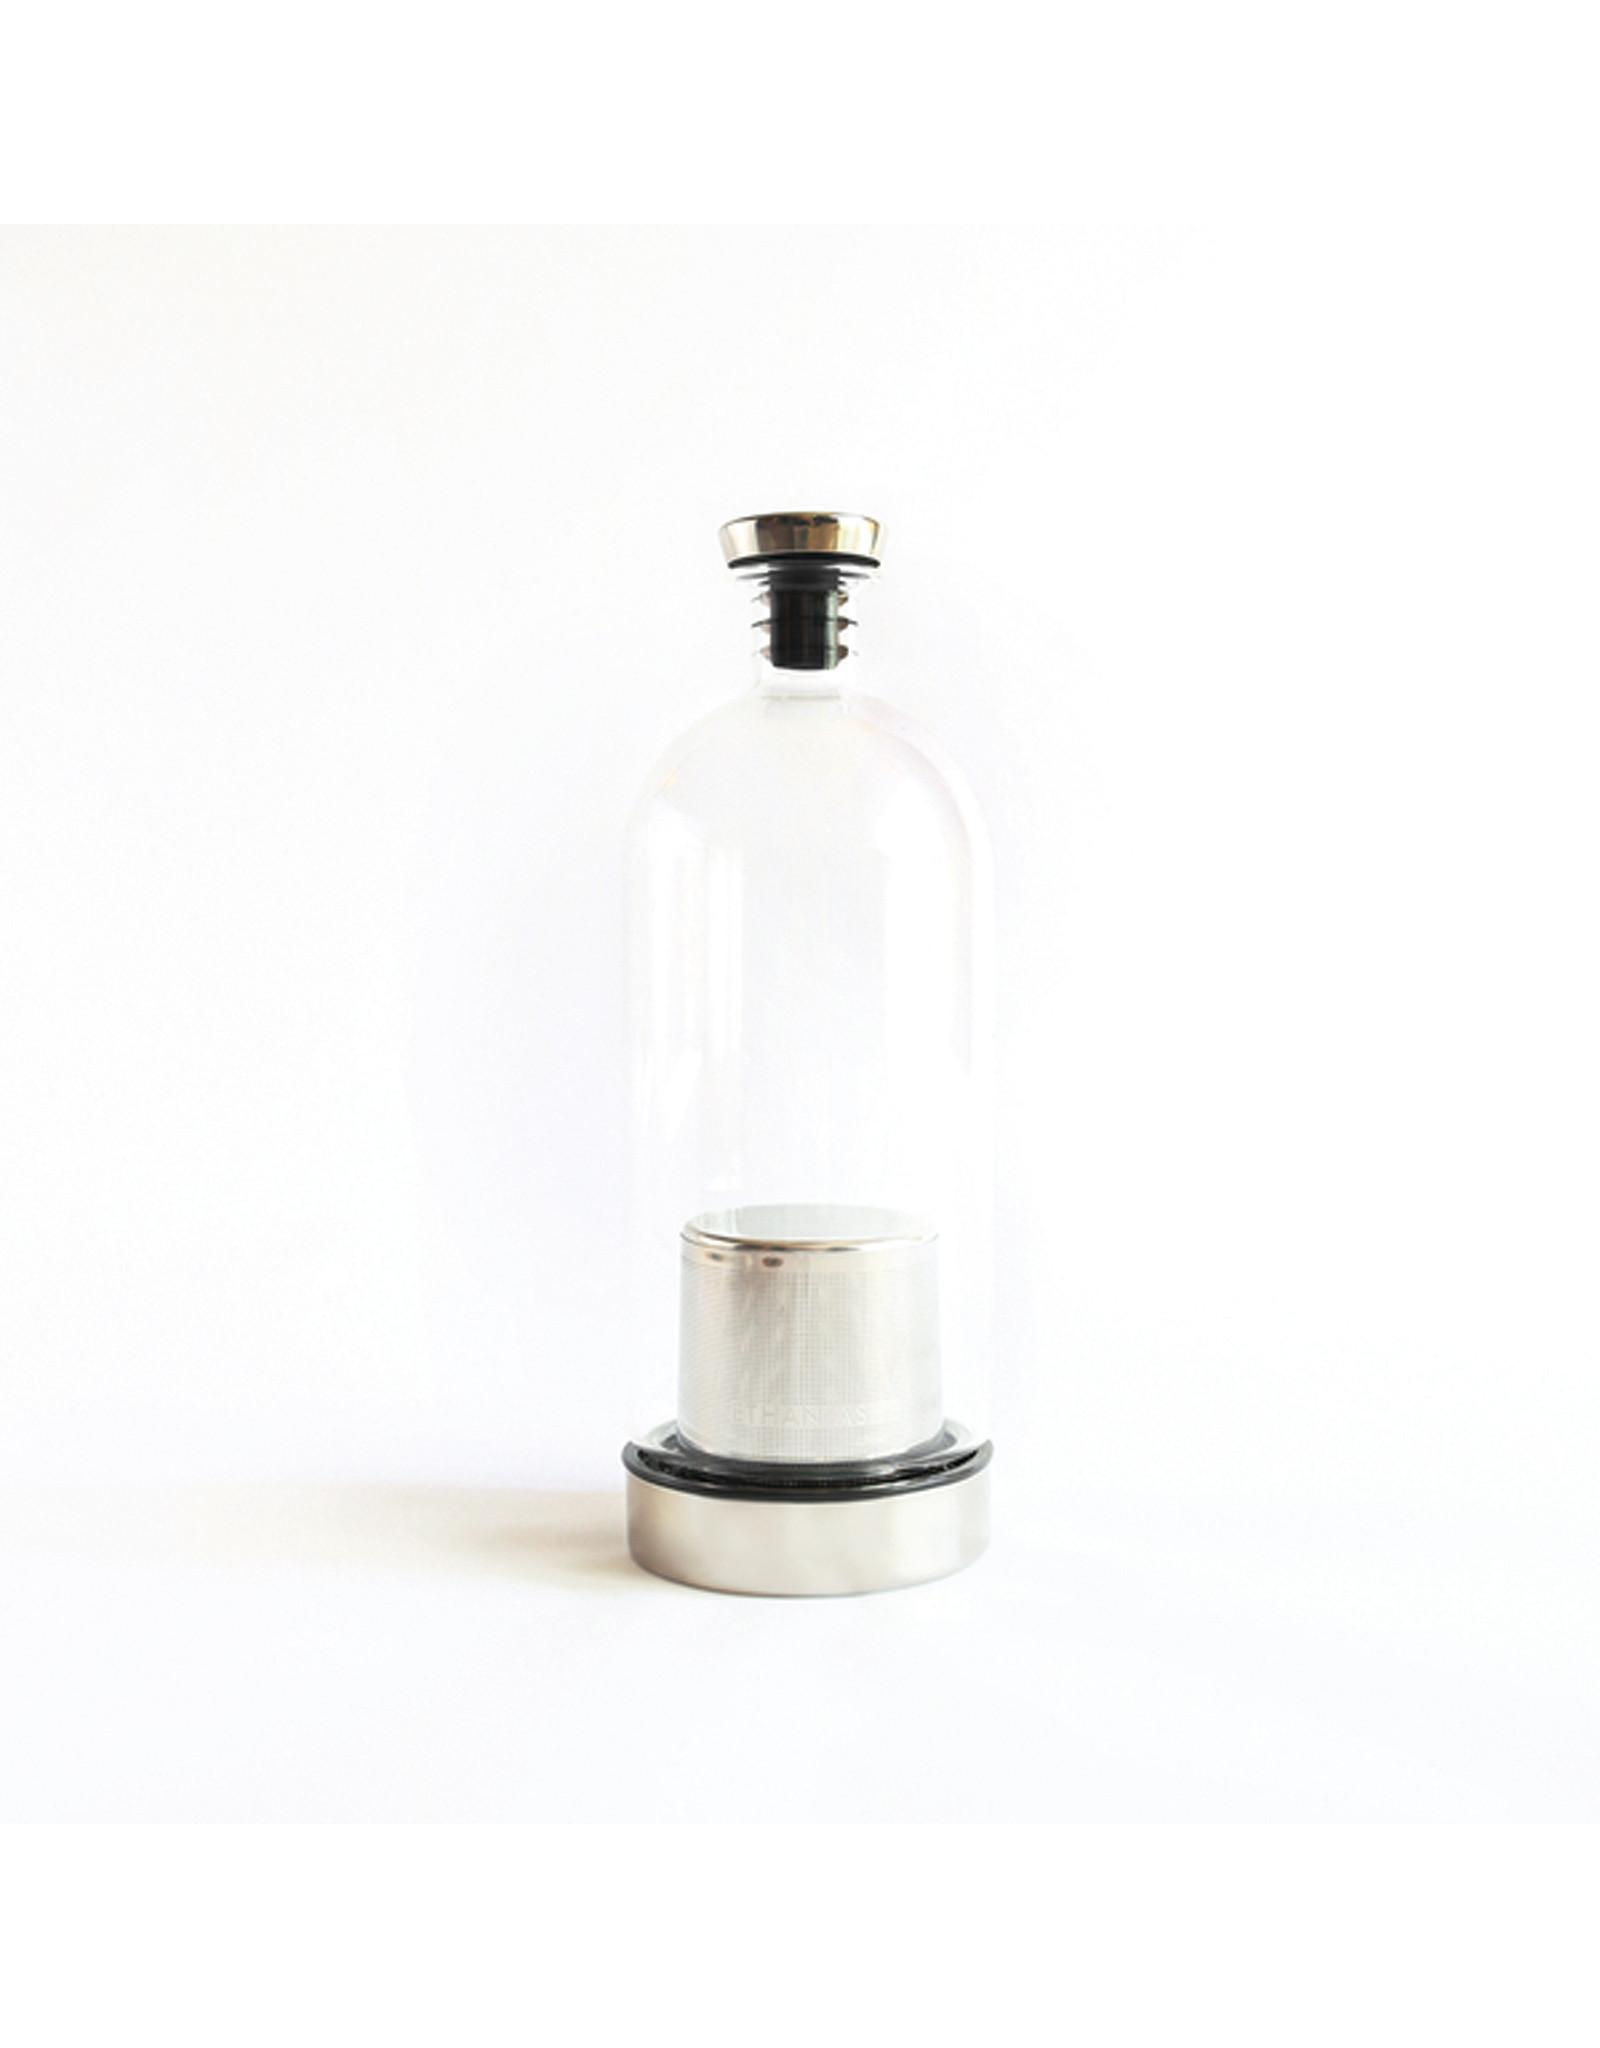 Alkemista Infusion Vessel, Silver